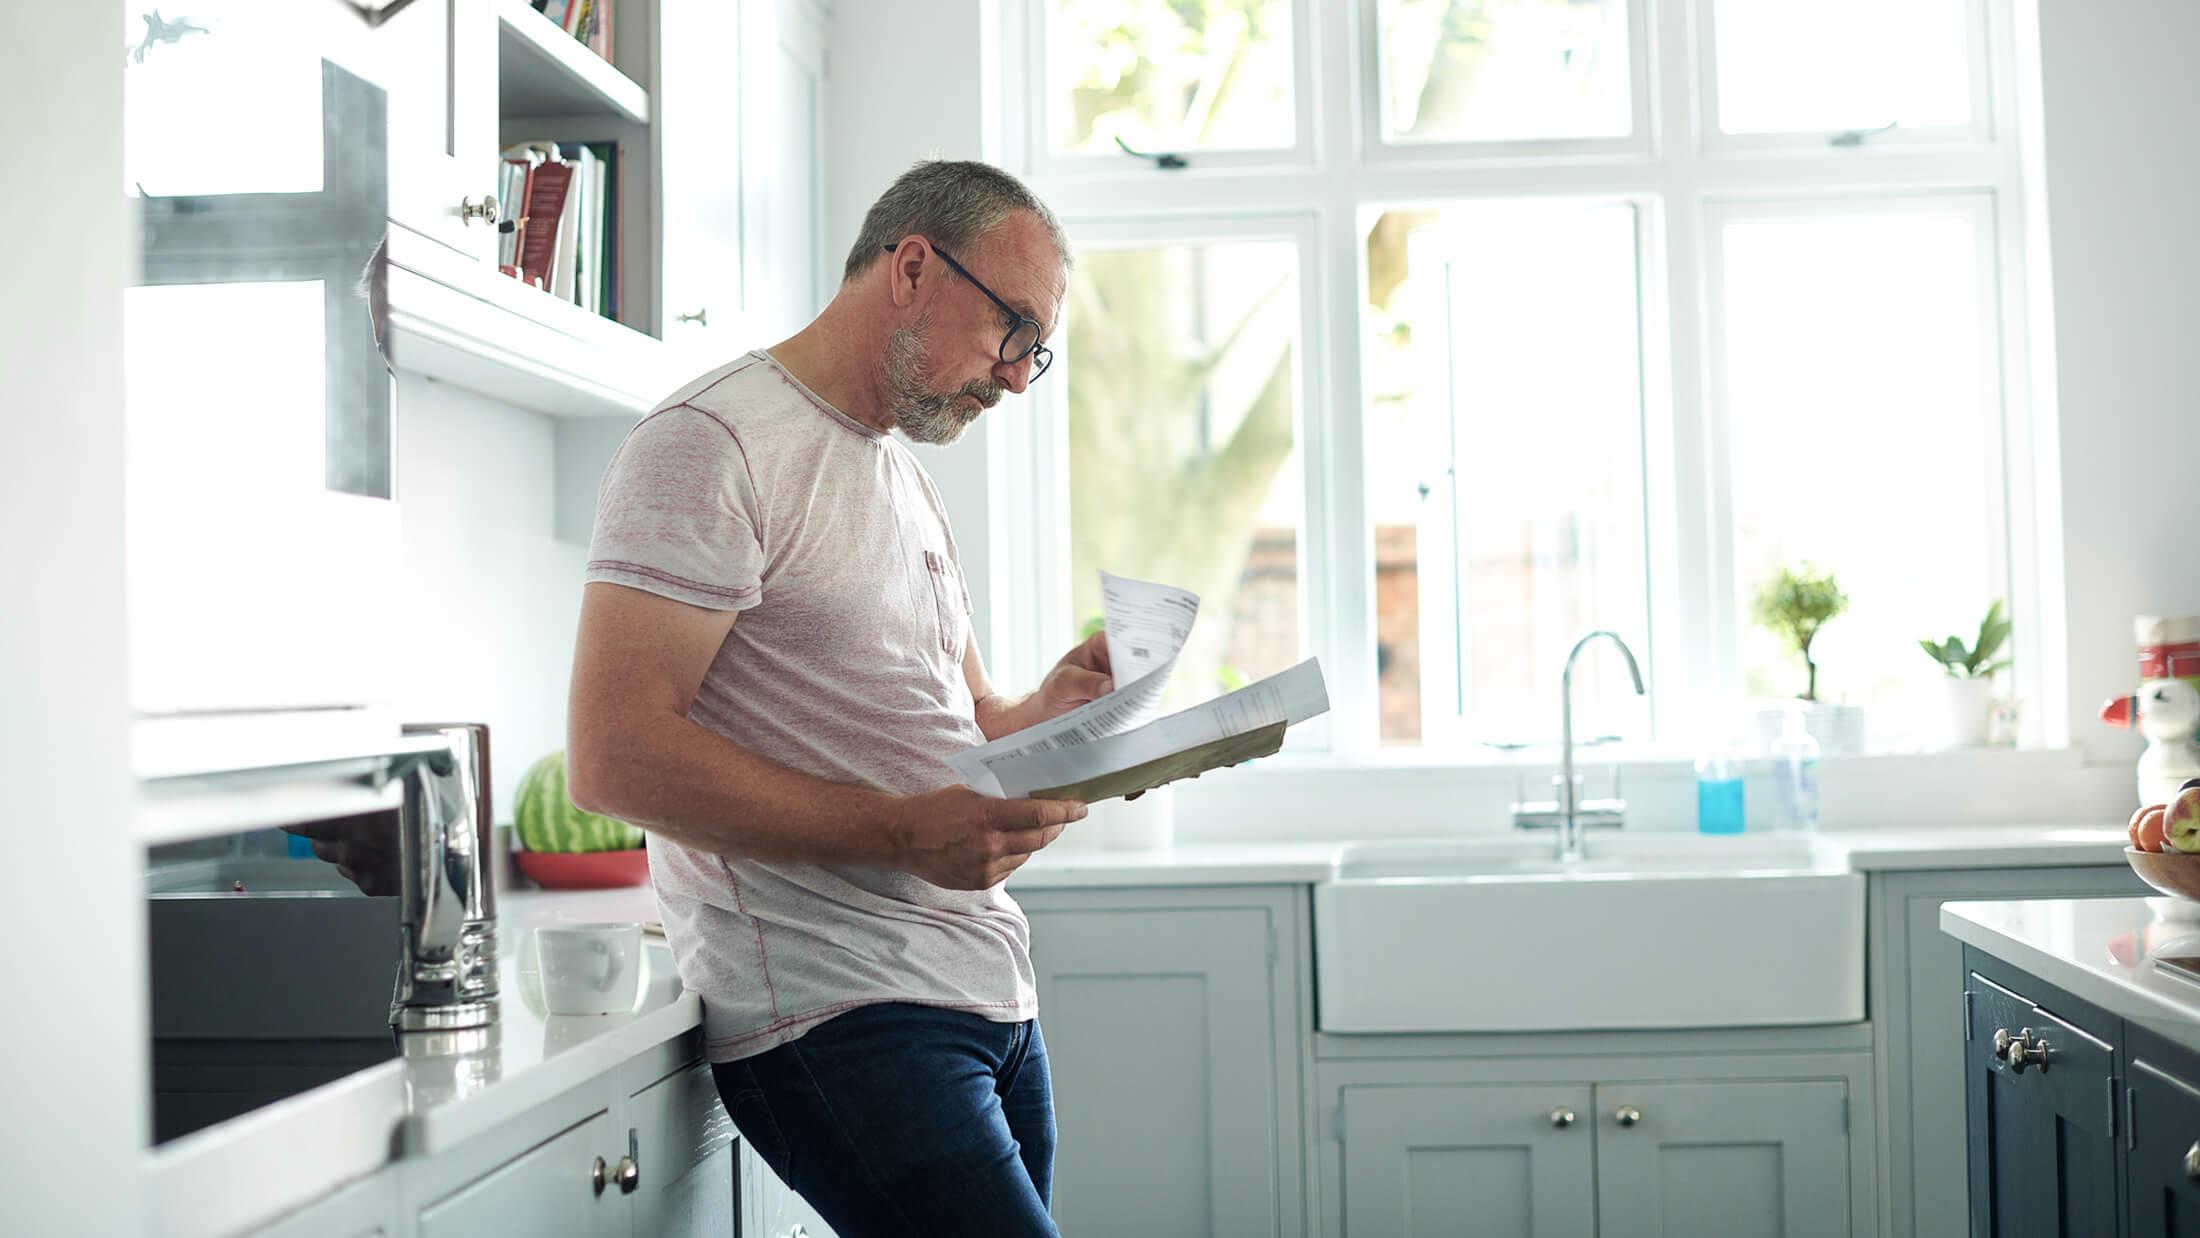 Mature man reading documents